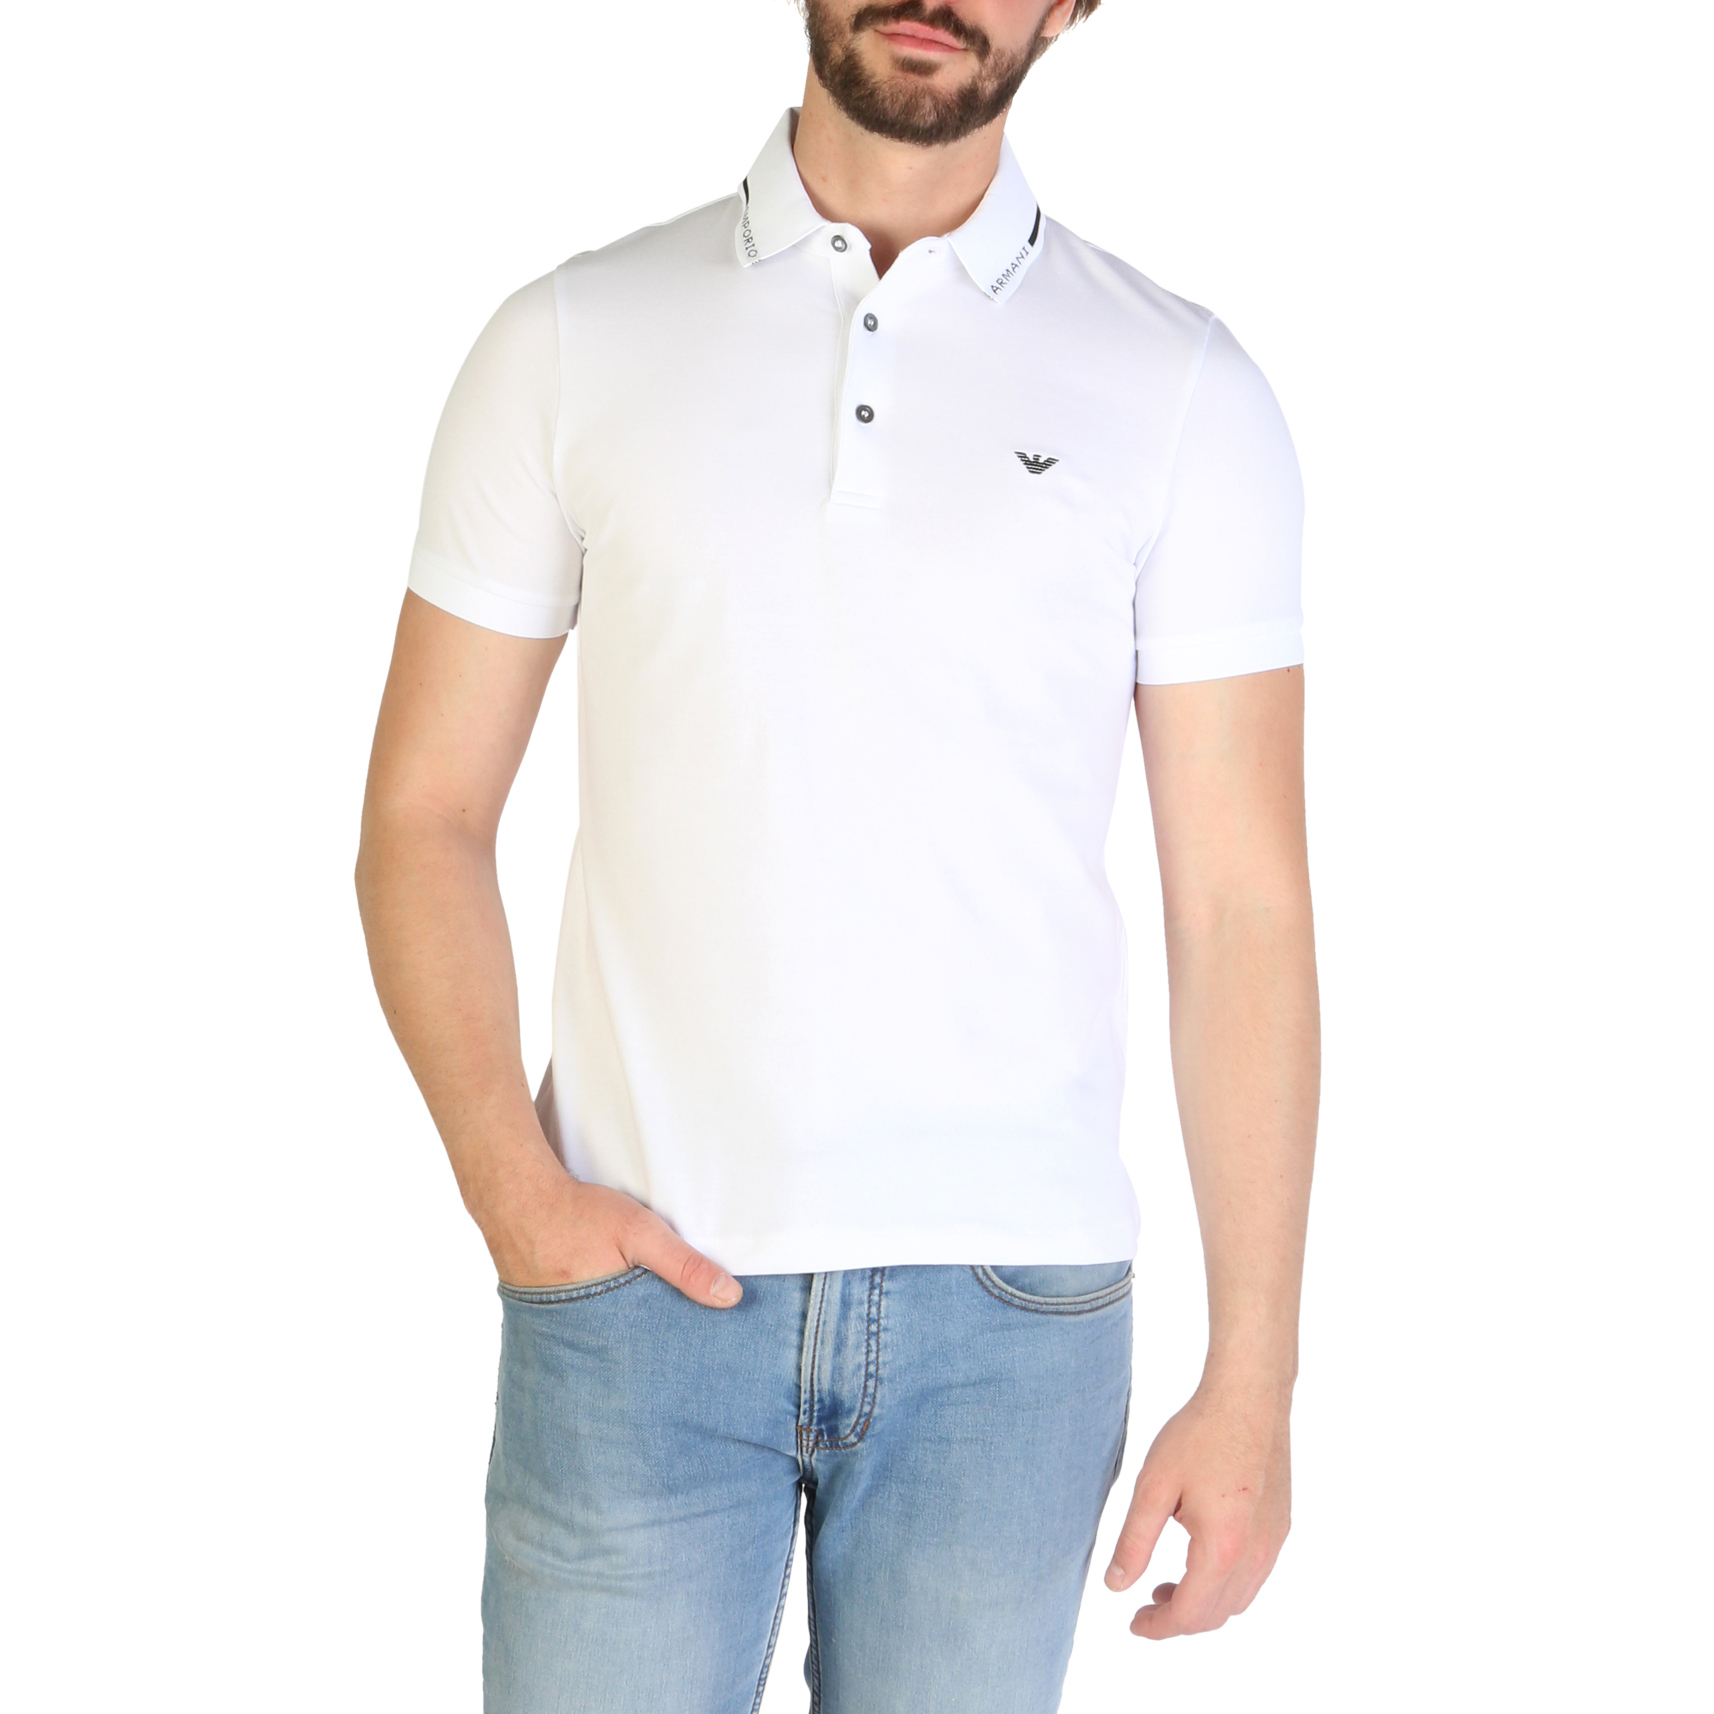 Polo Emporio Armani 3G1FL4 Uomo Bianco 101239